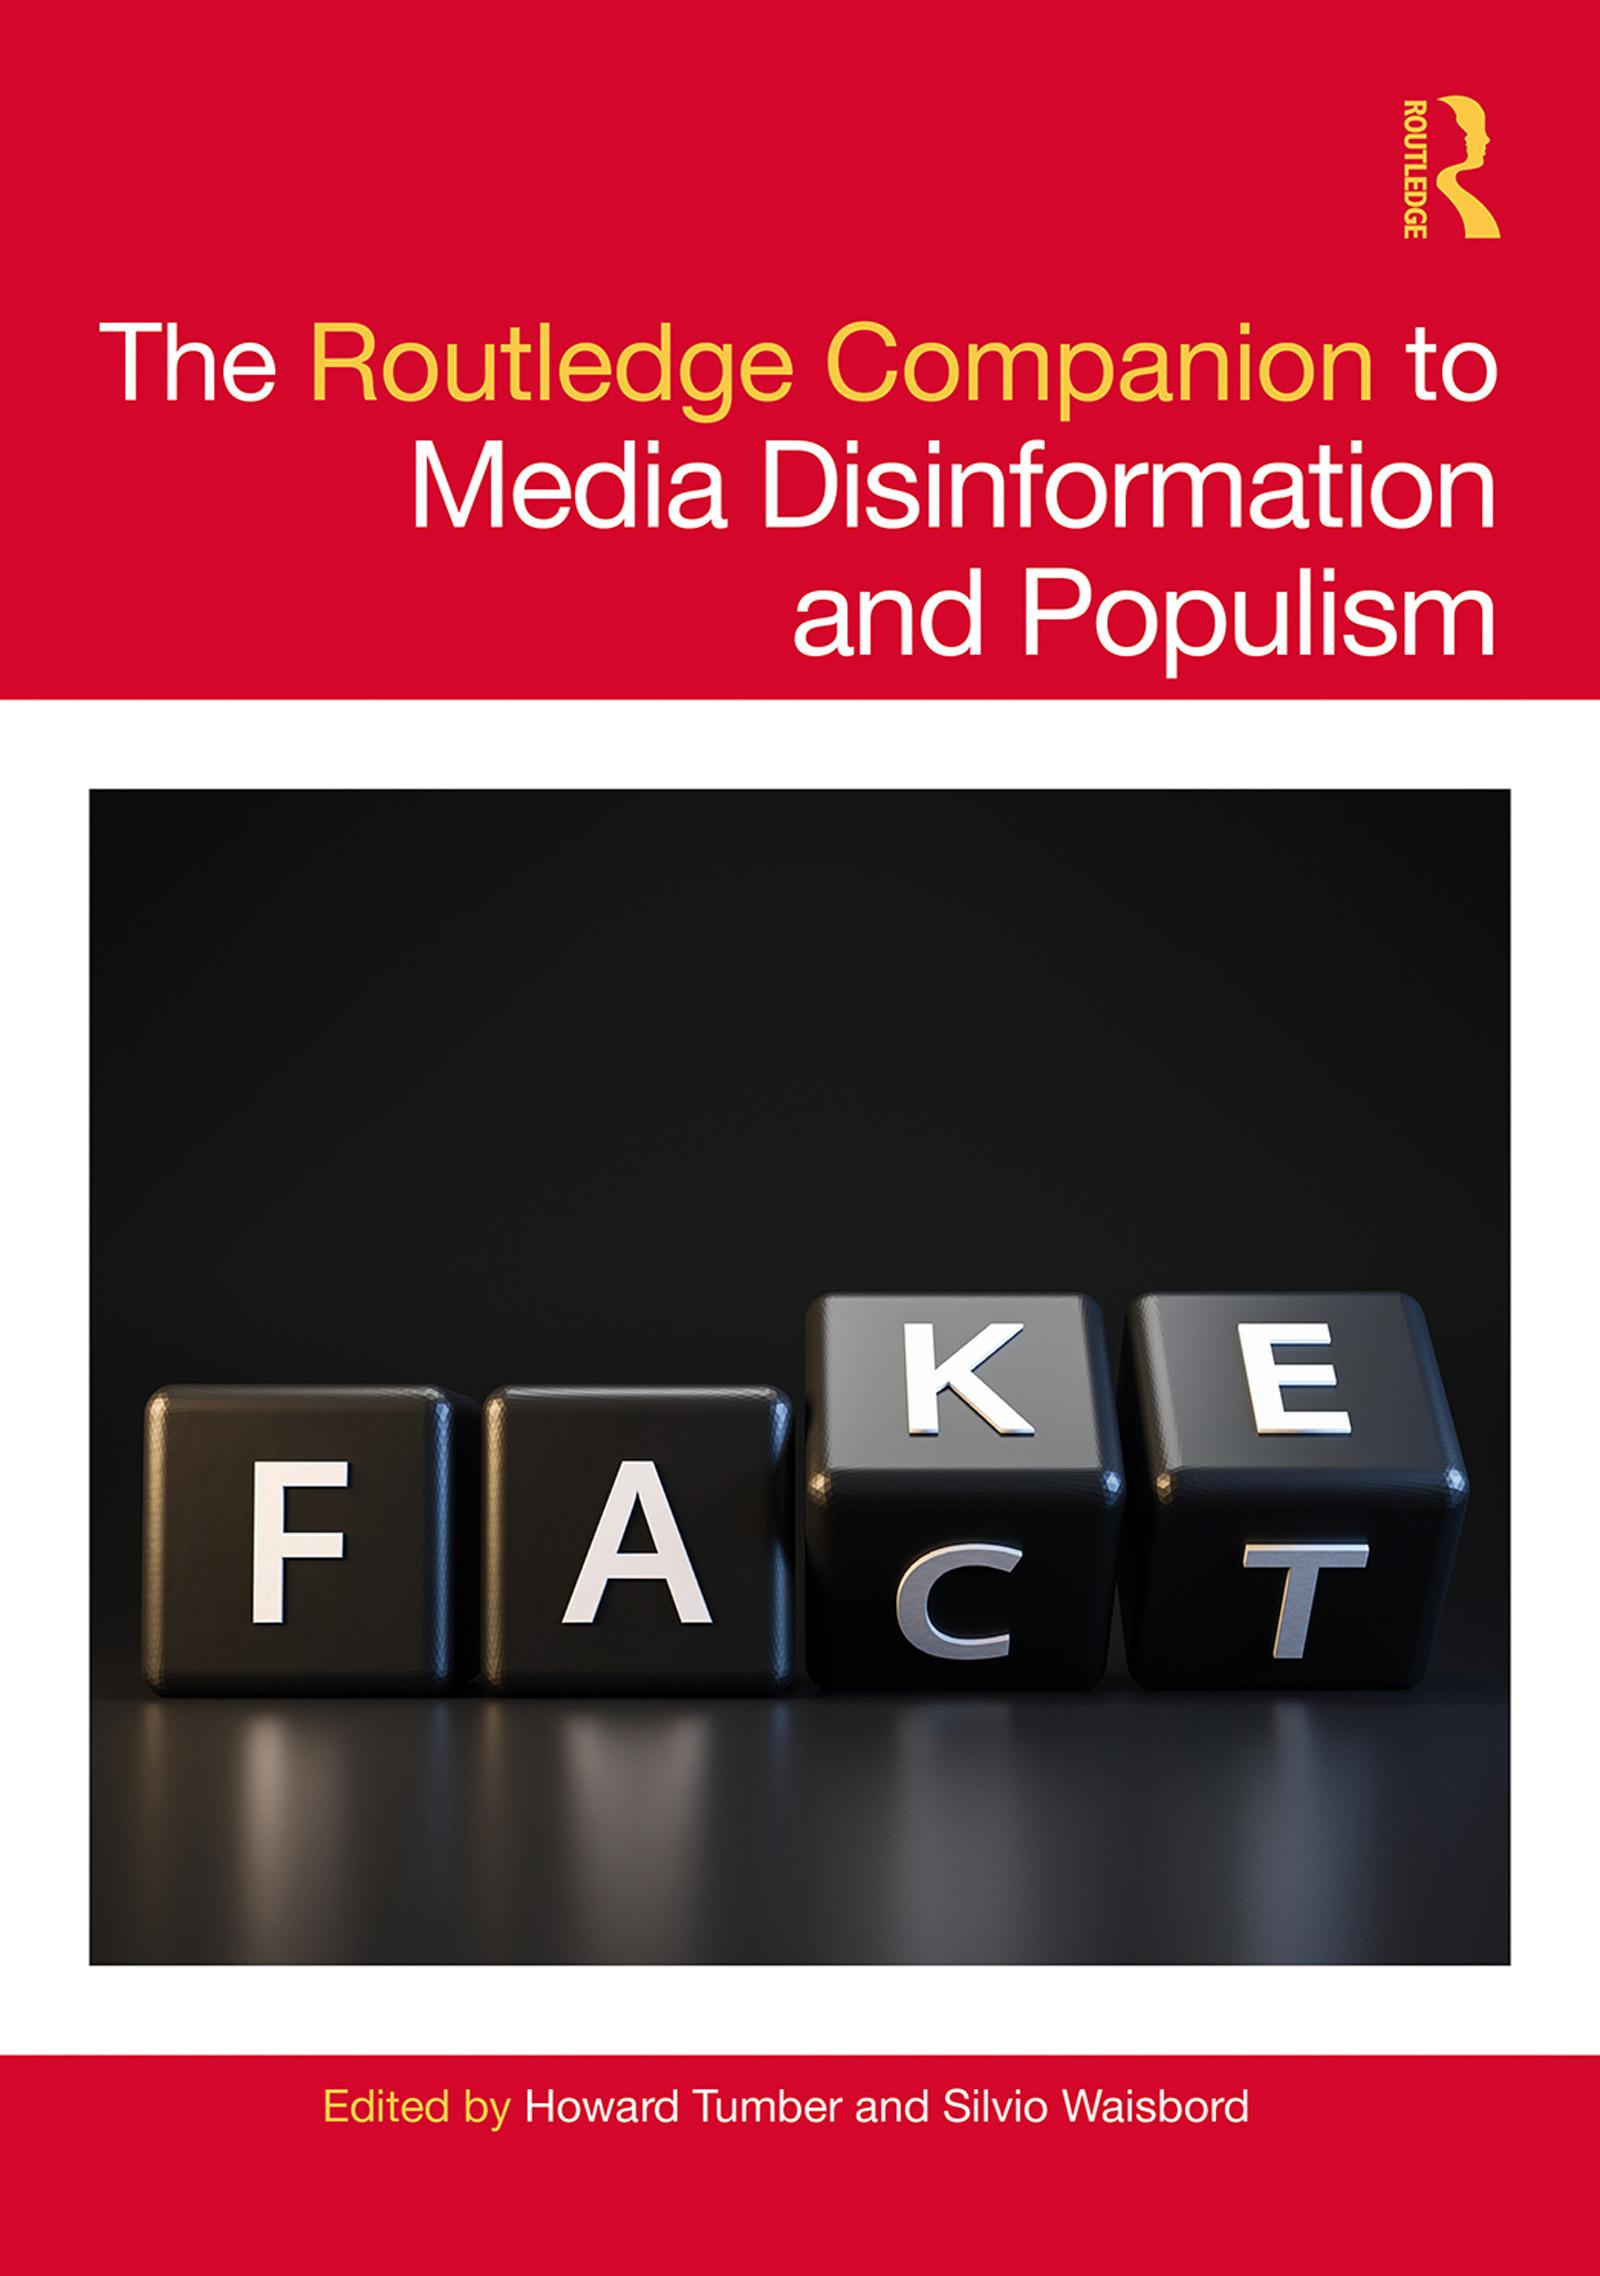 Misogyny and the politics of misinformation